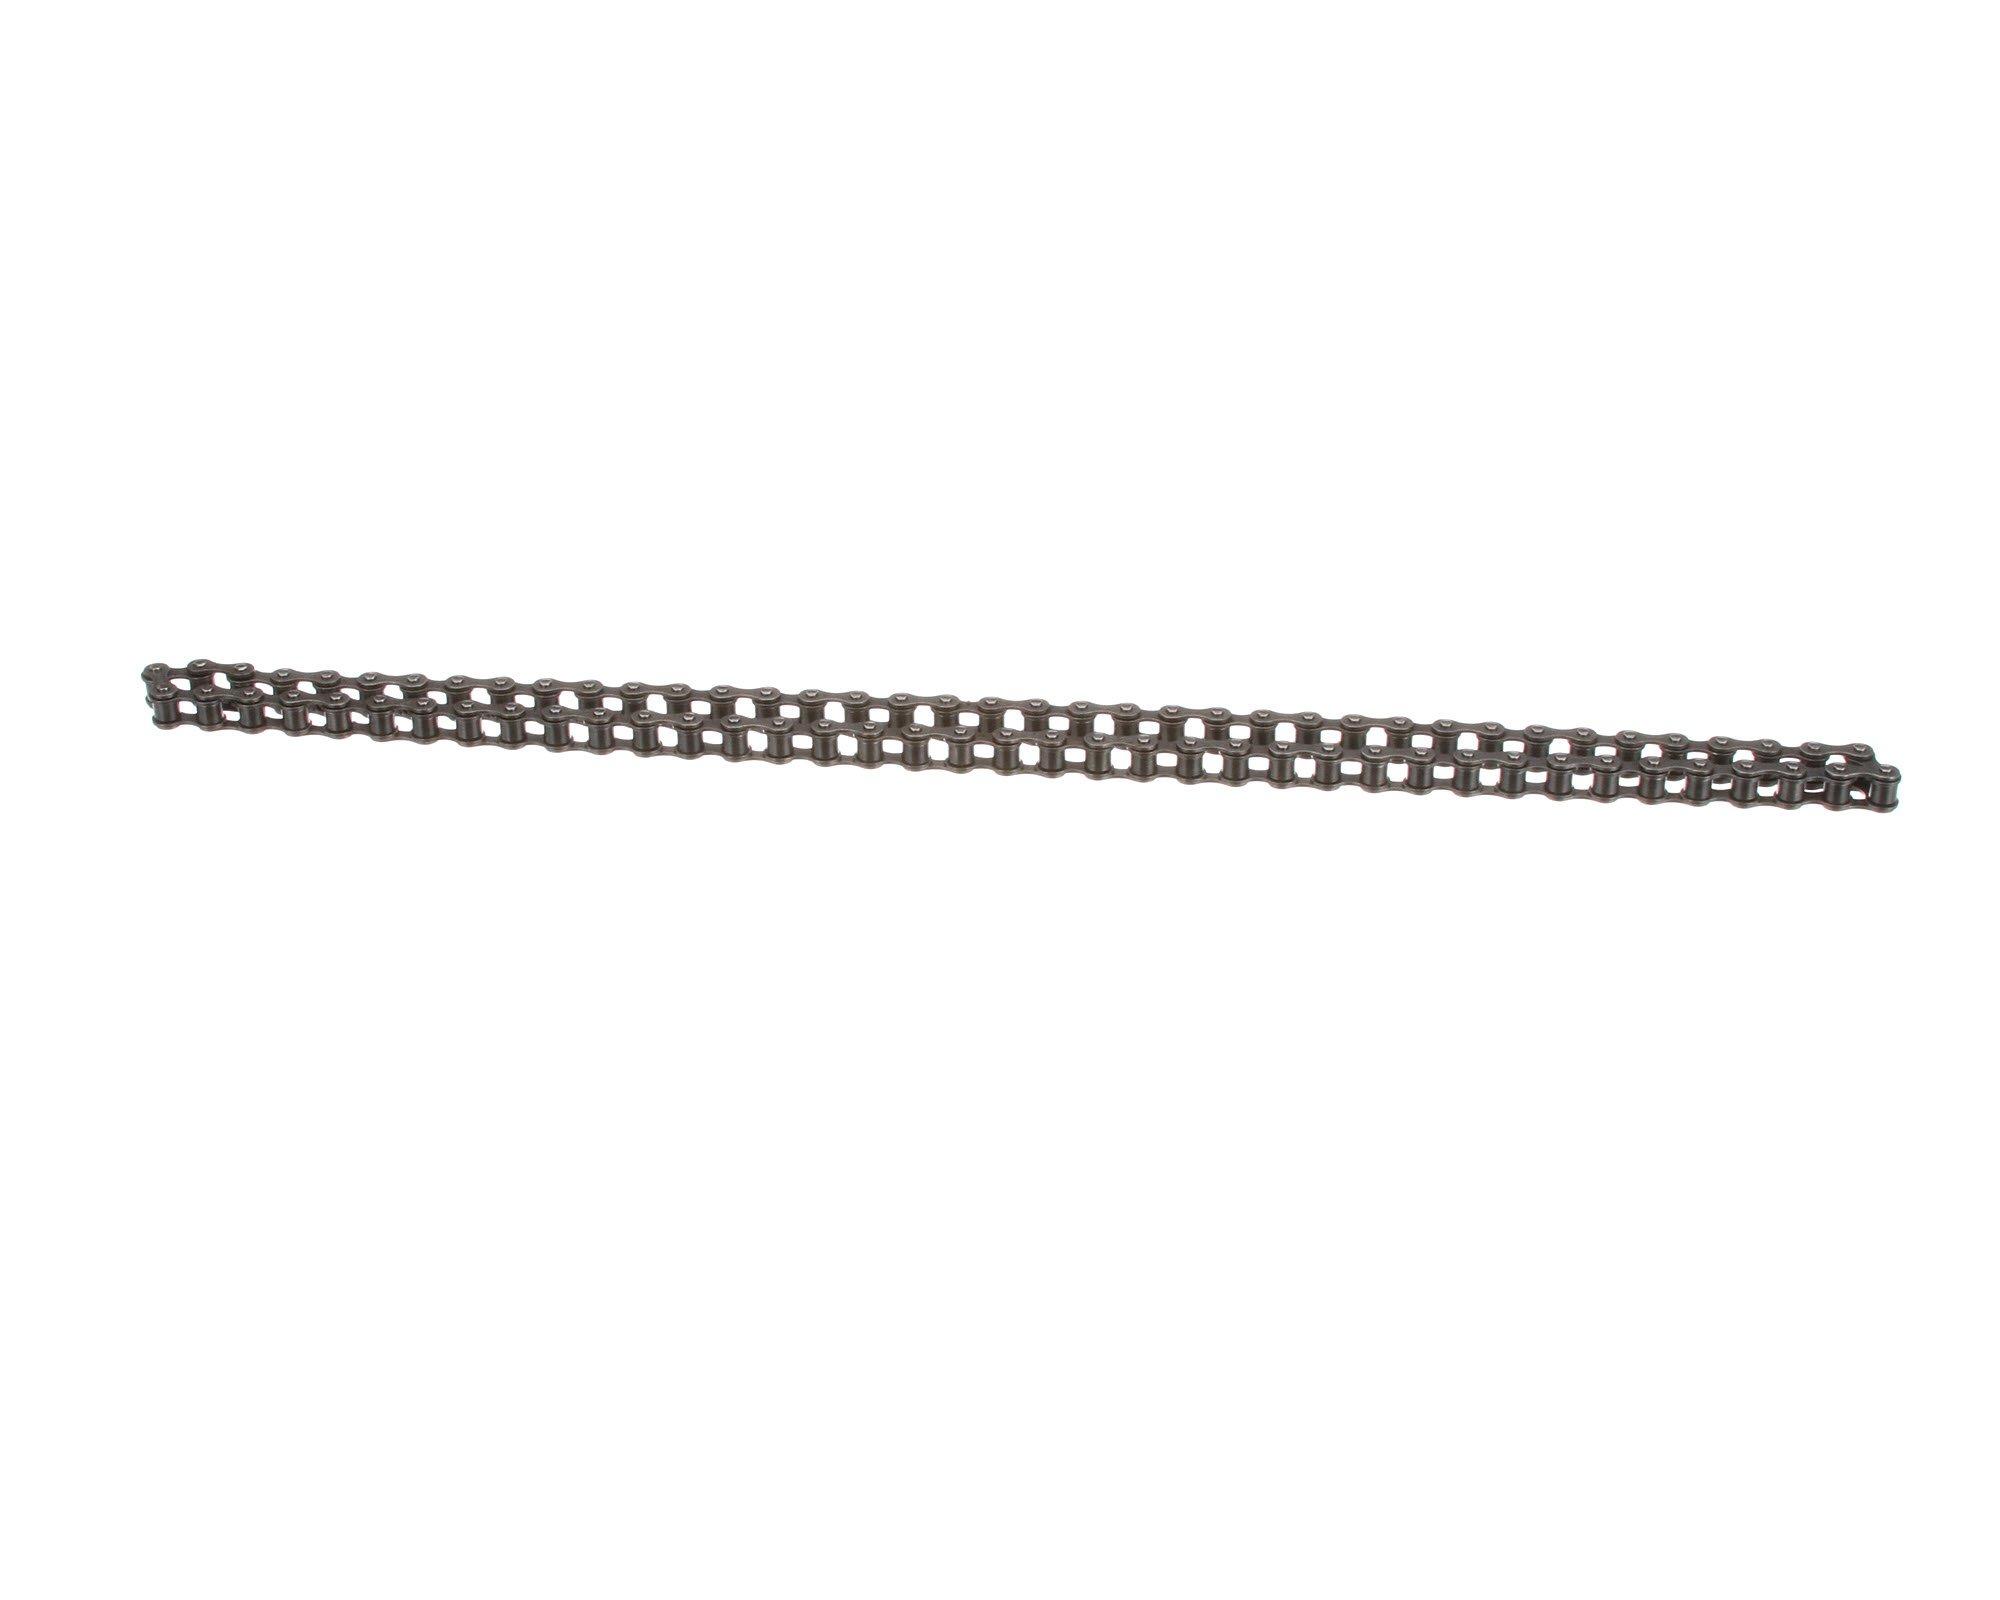 Somerset Industries 4000-359 Chain 41 RIV 78 Incl 1 C/L (15